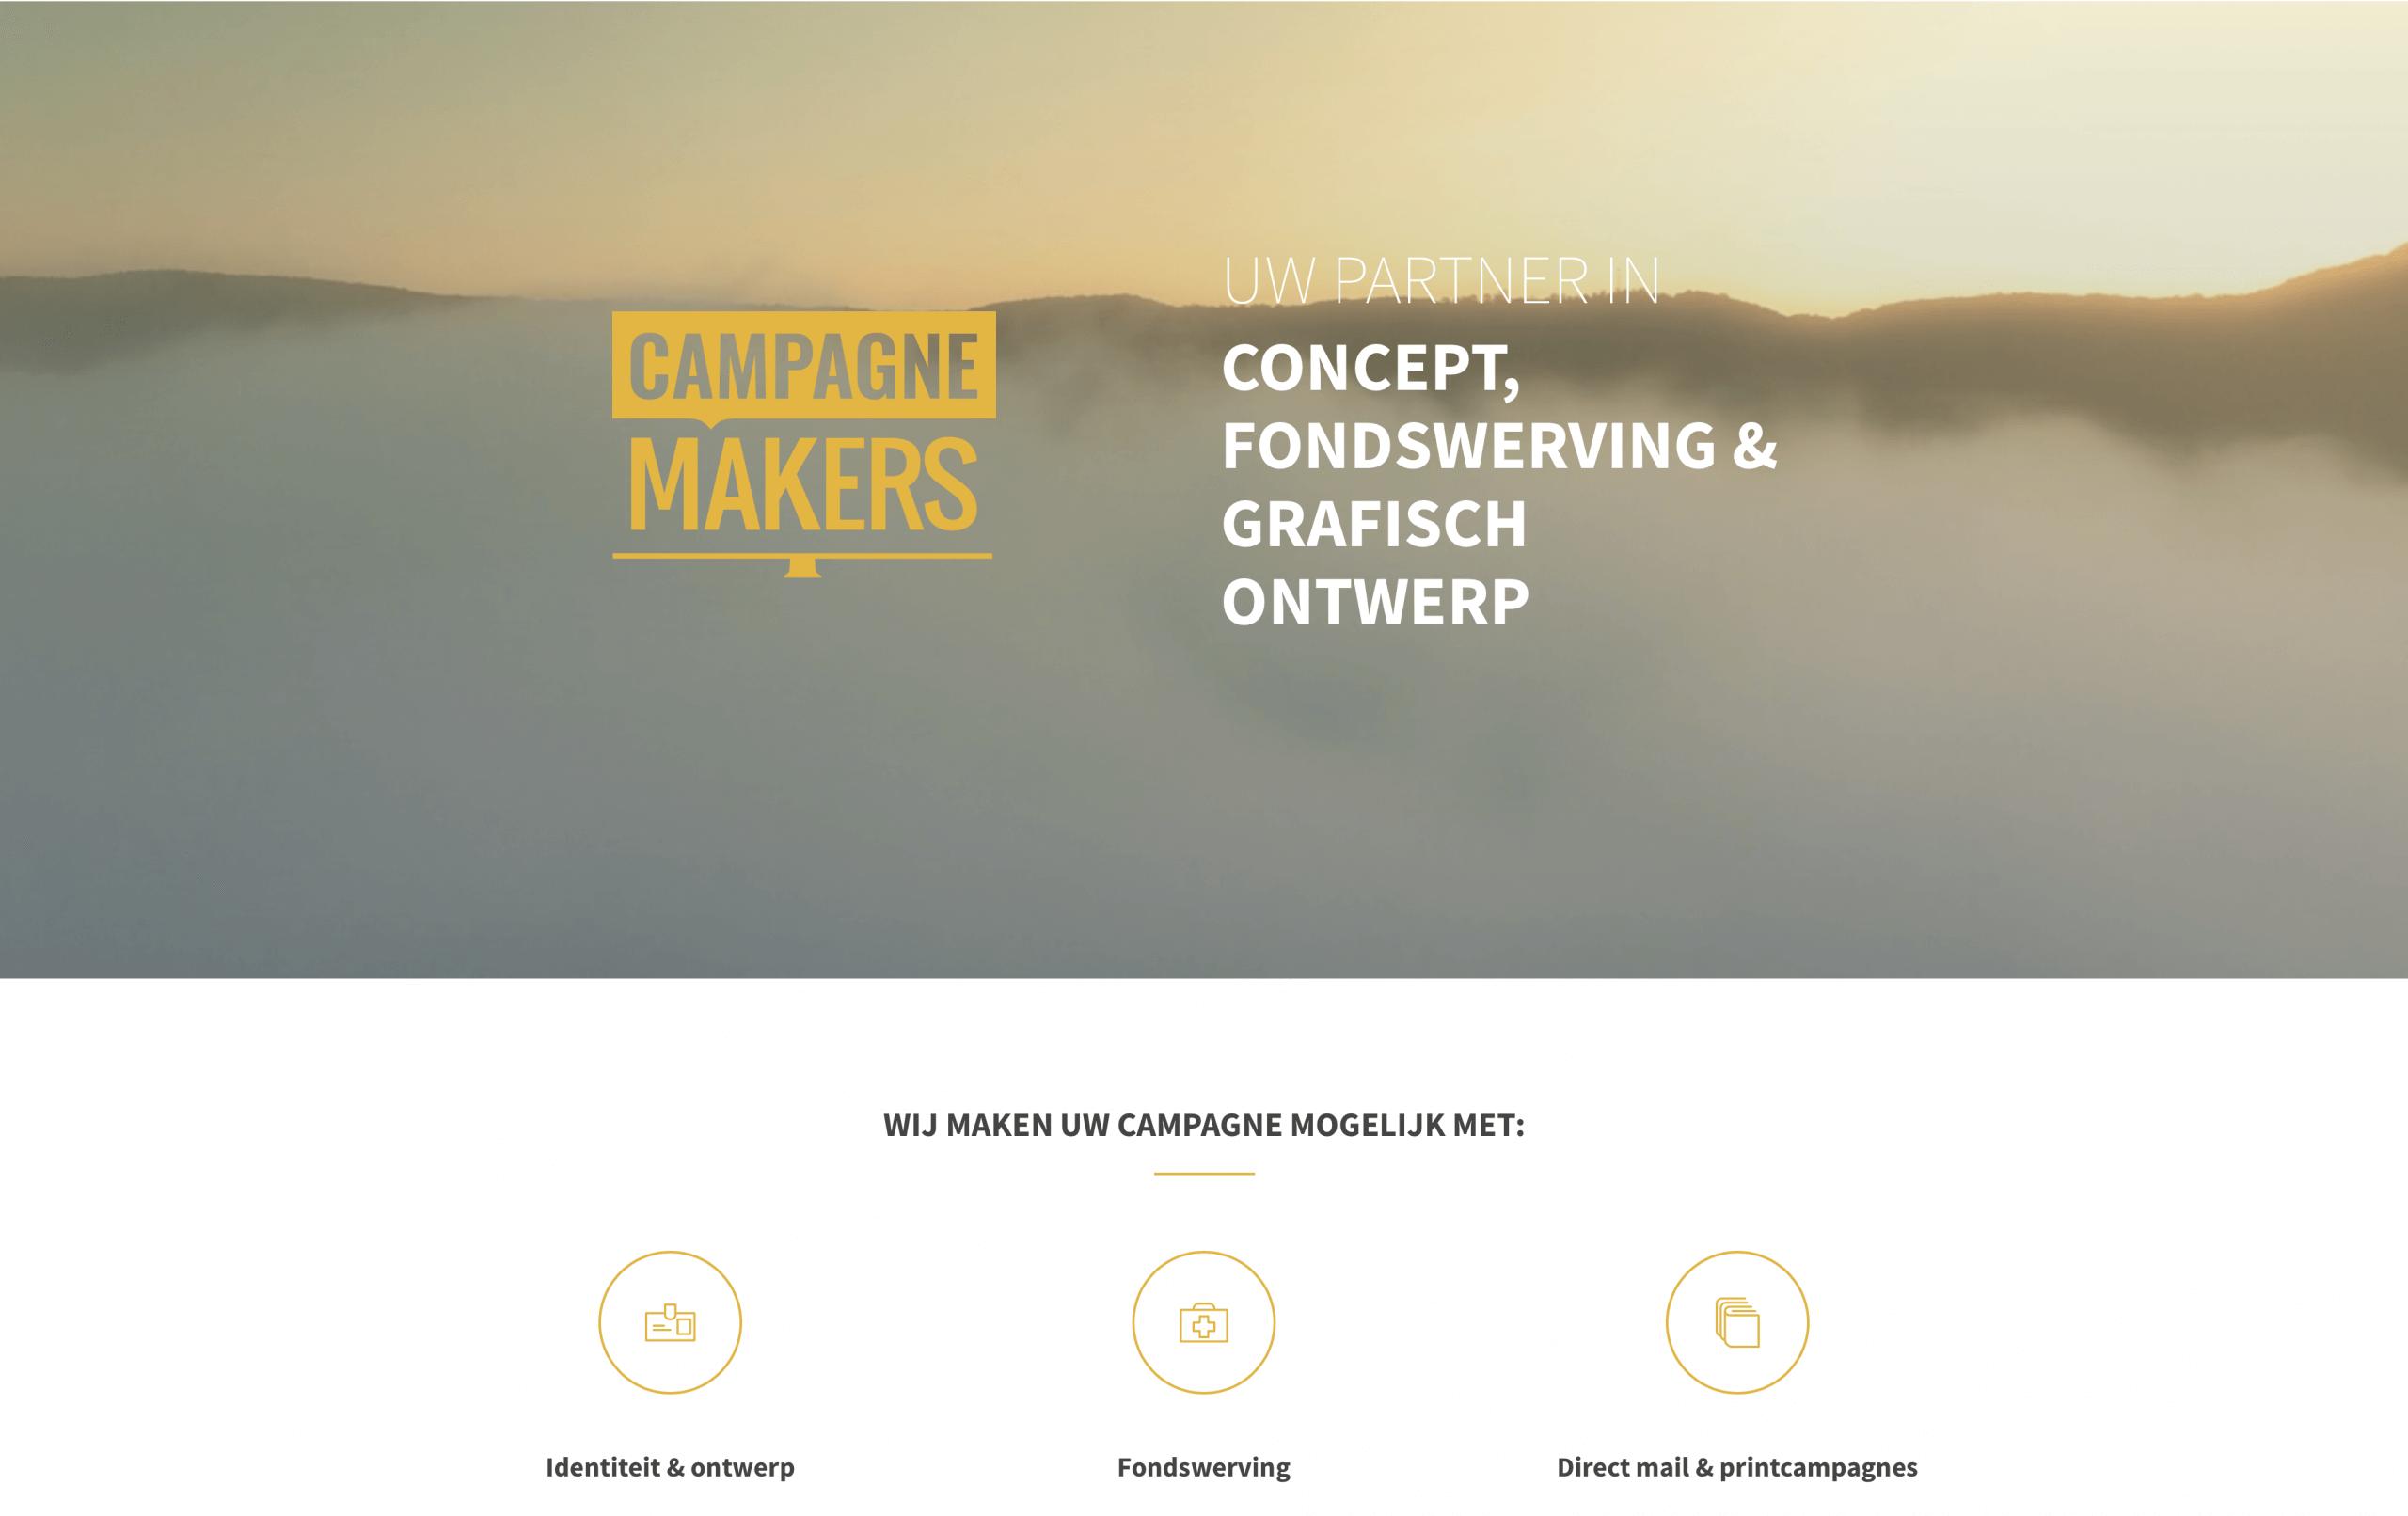 CampagneMakers van start